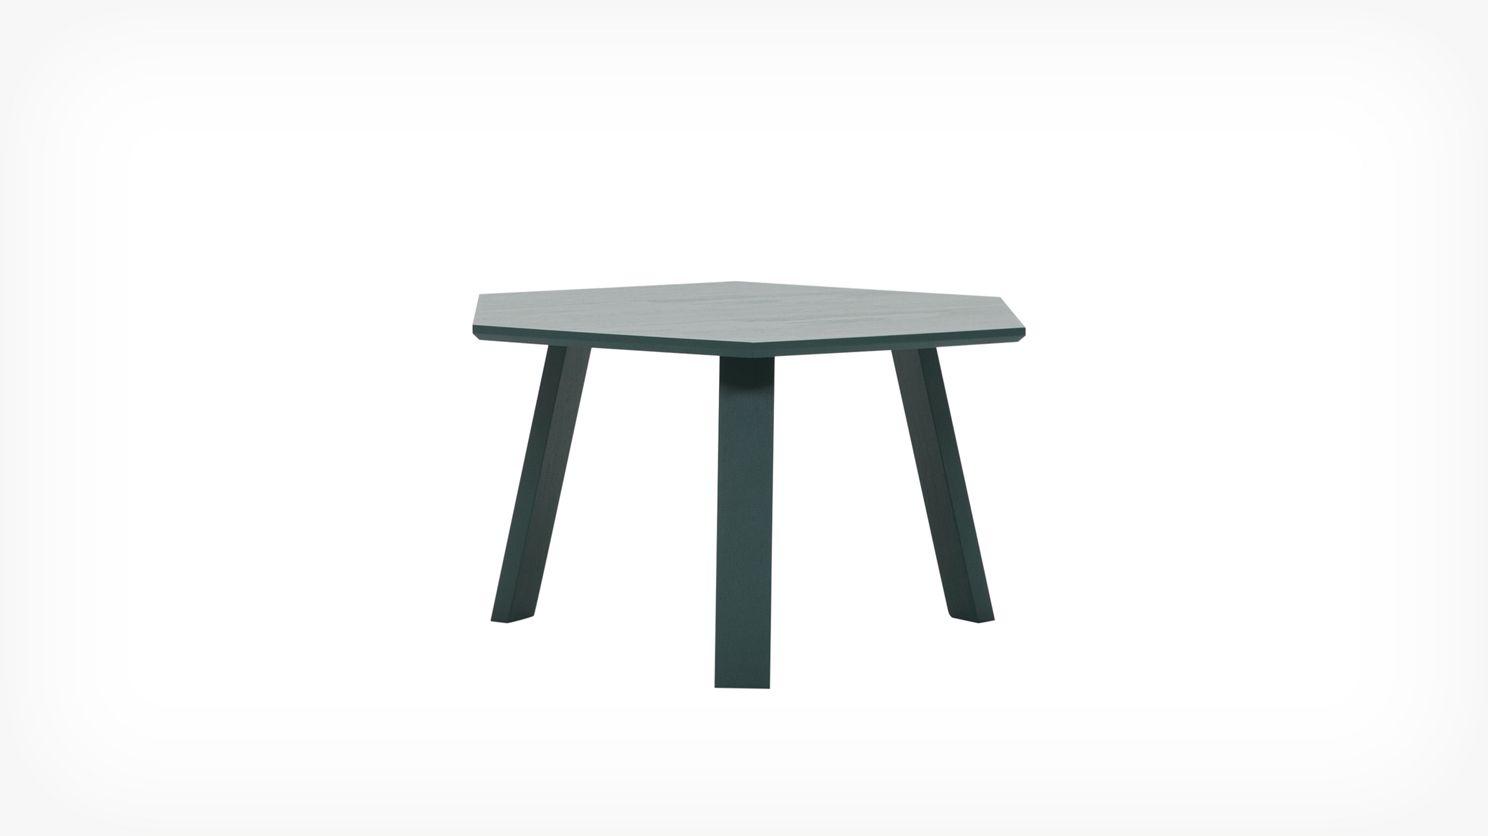 Haptic Coffee Table Eq3 Modern Furniture From Canada 28 X 24